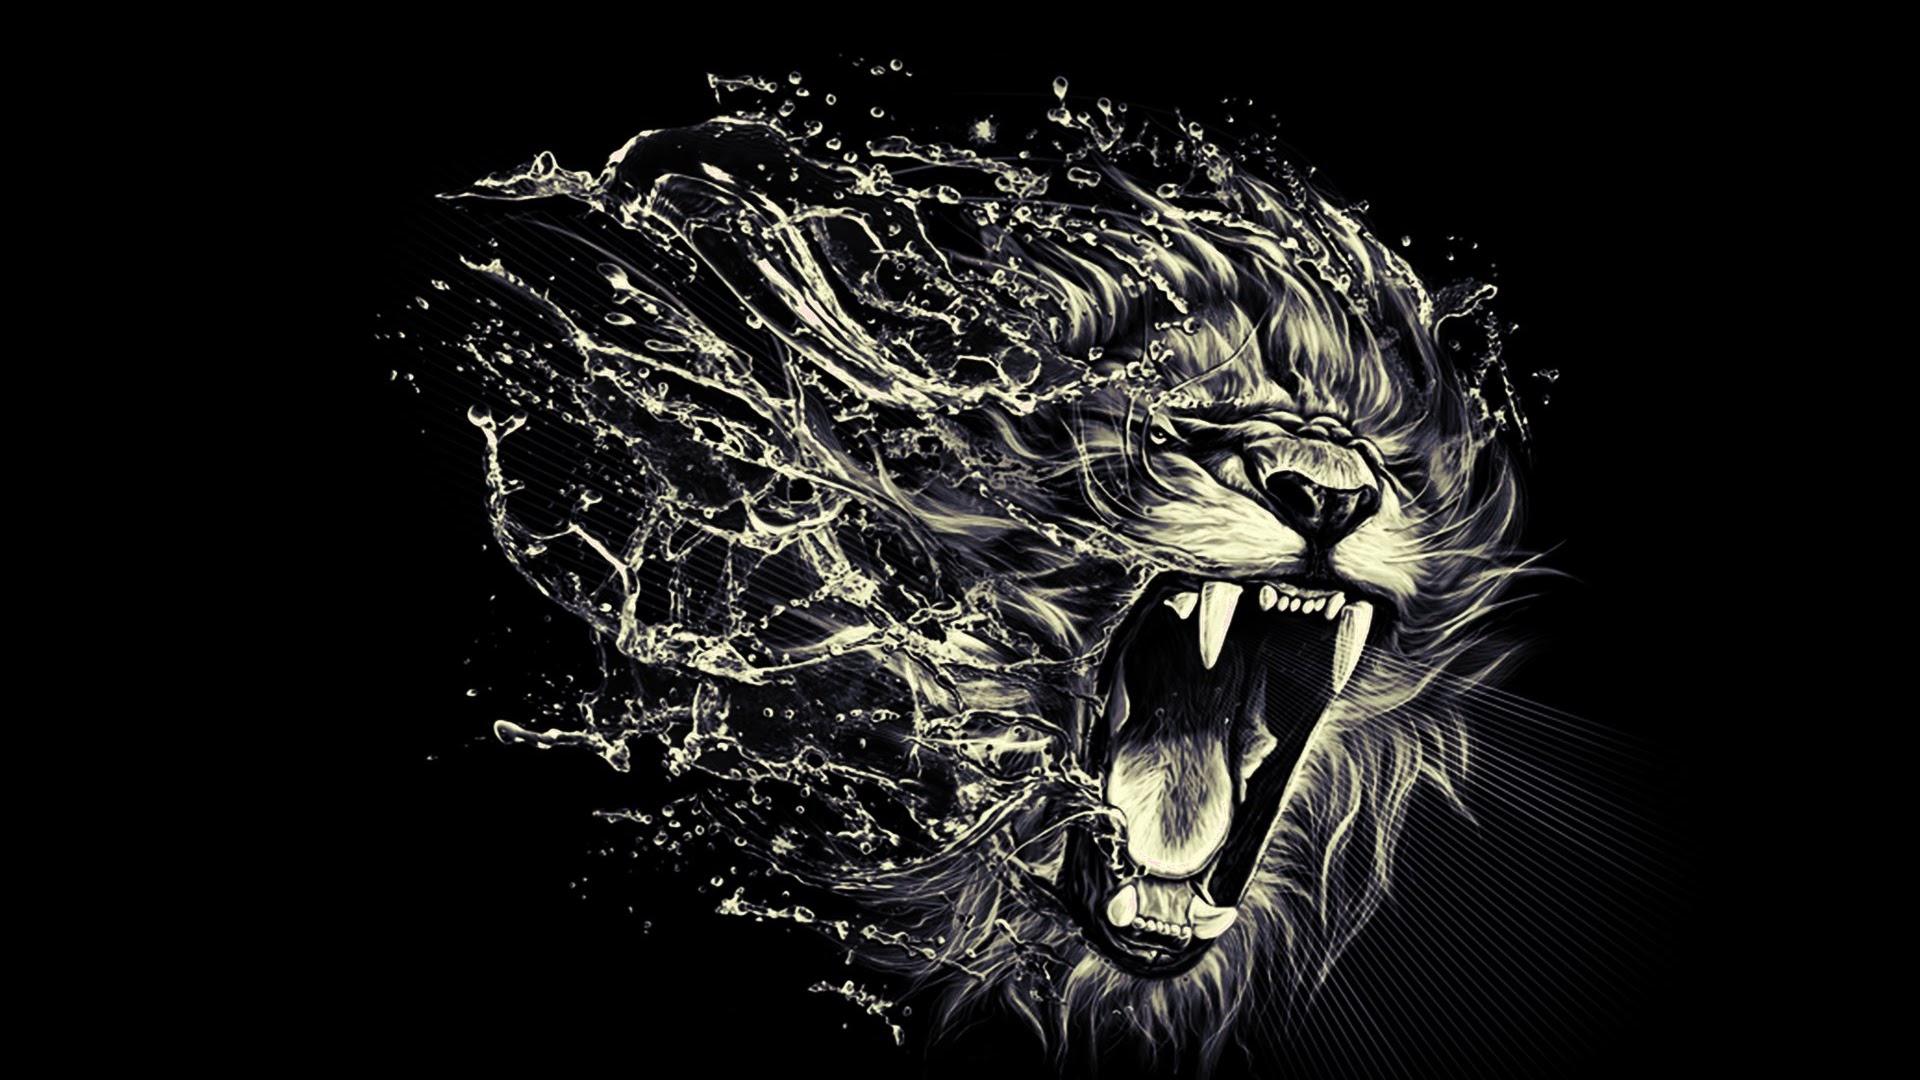 Lion Wallpaper – High Quality HD Quality Photos | HD Quality 1080P